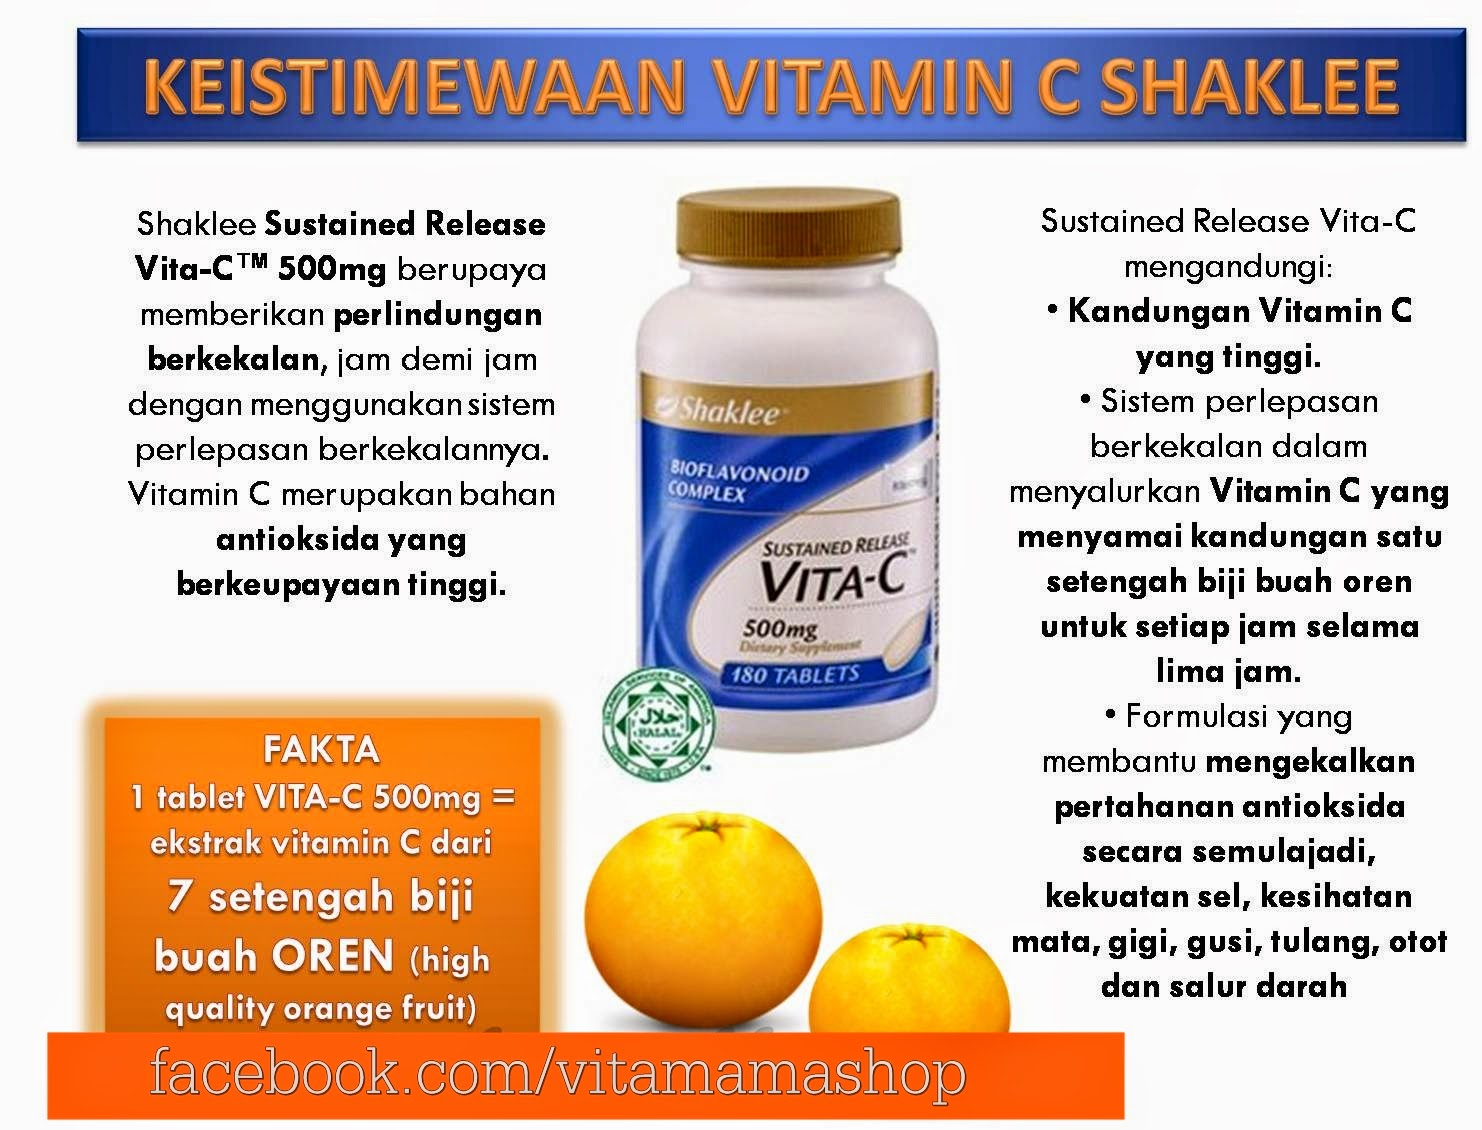 beza vitamin c shaklee dengan vitamin lain